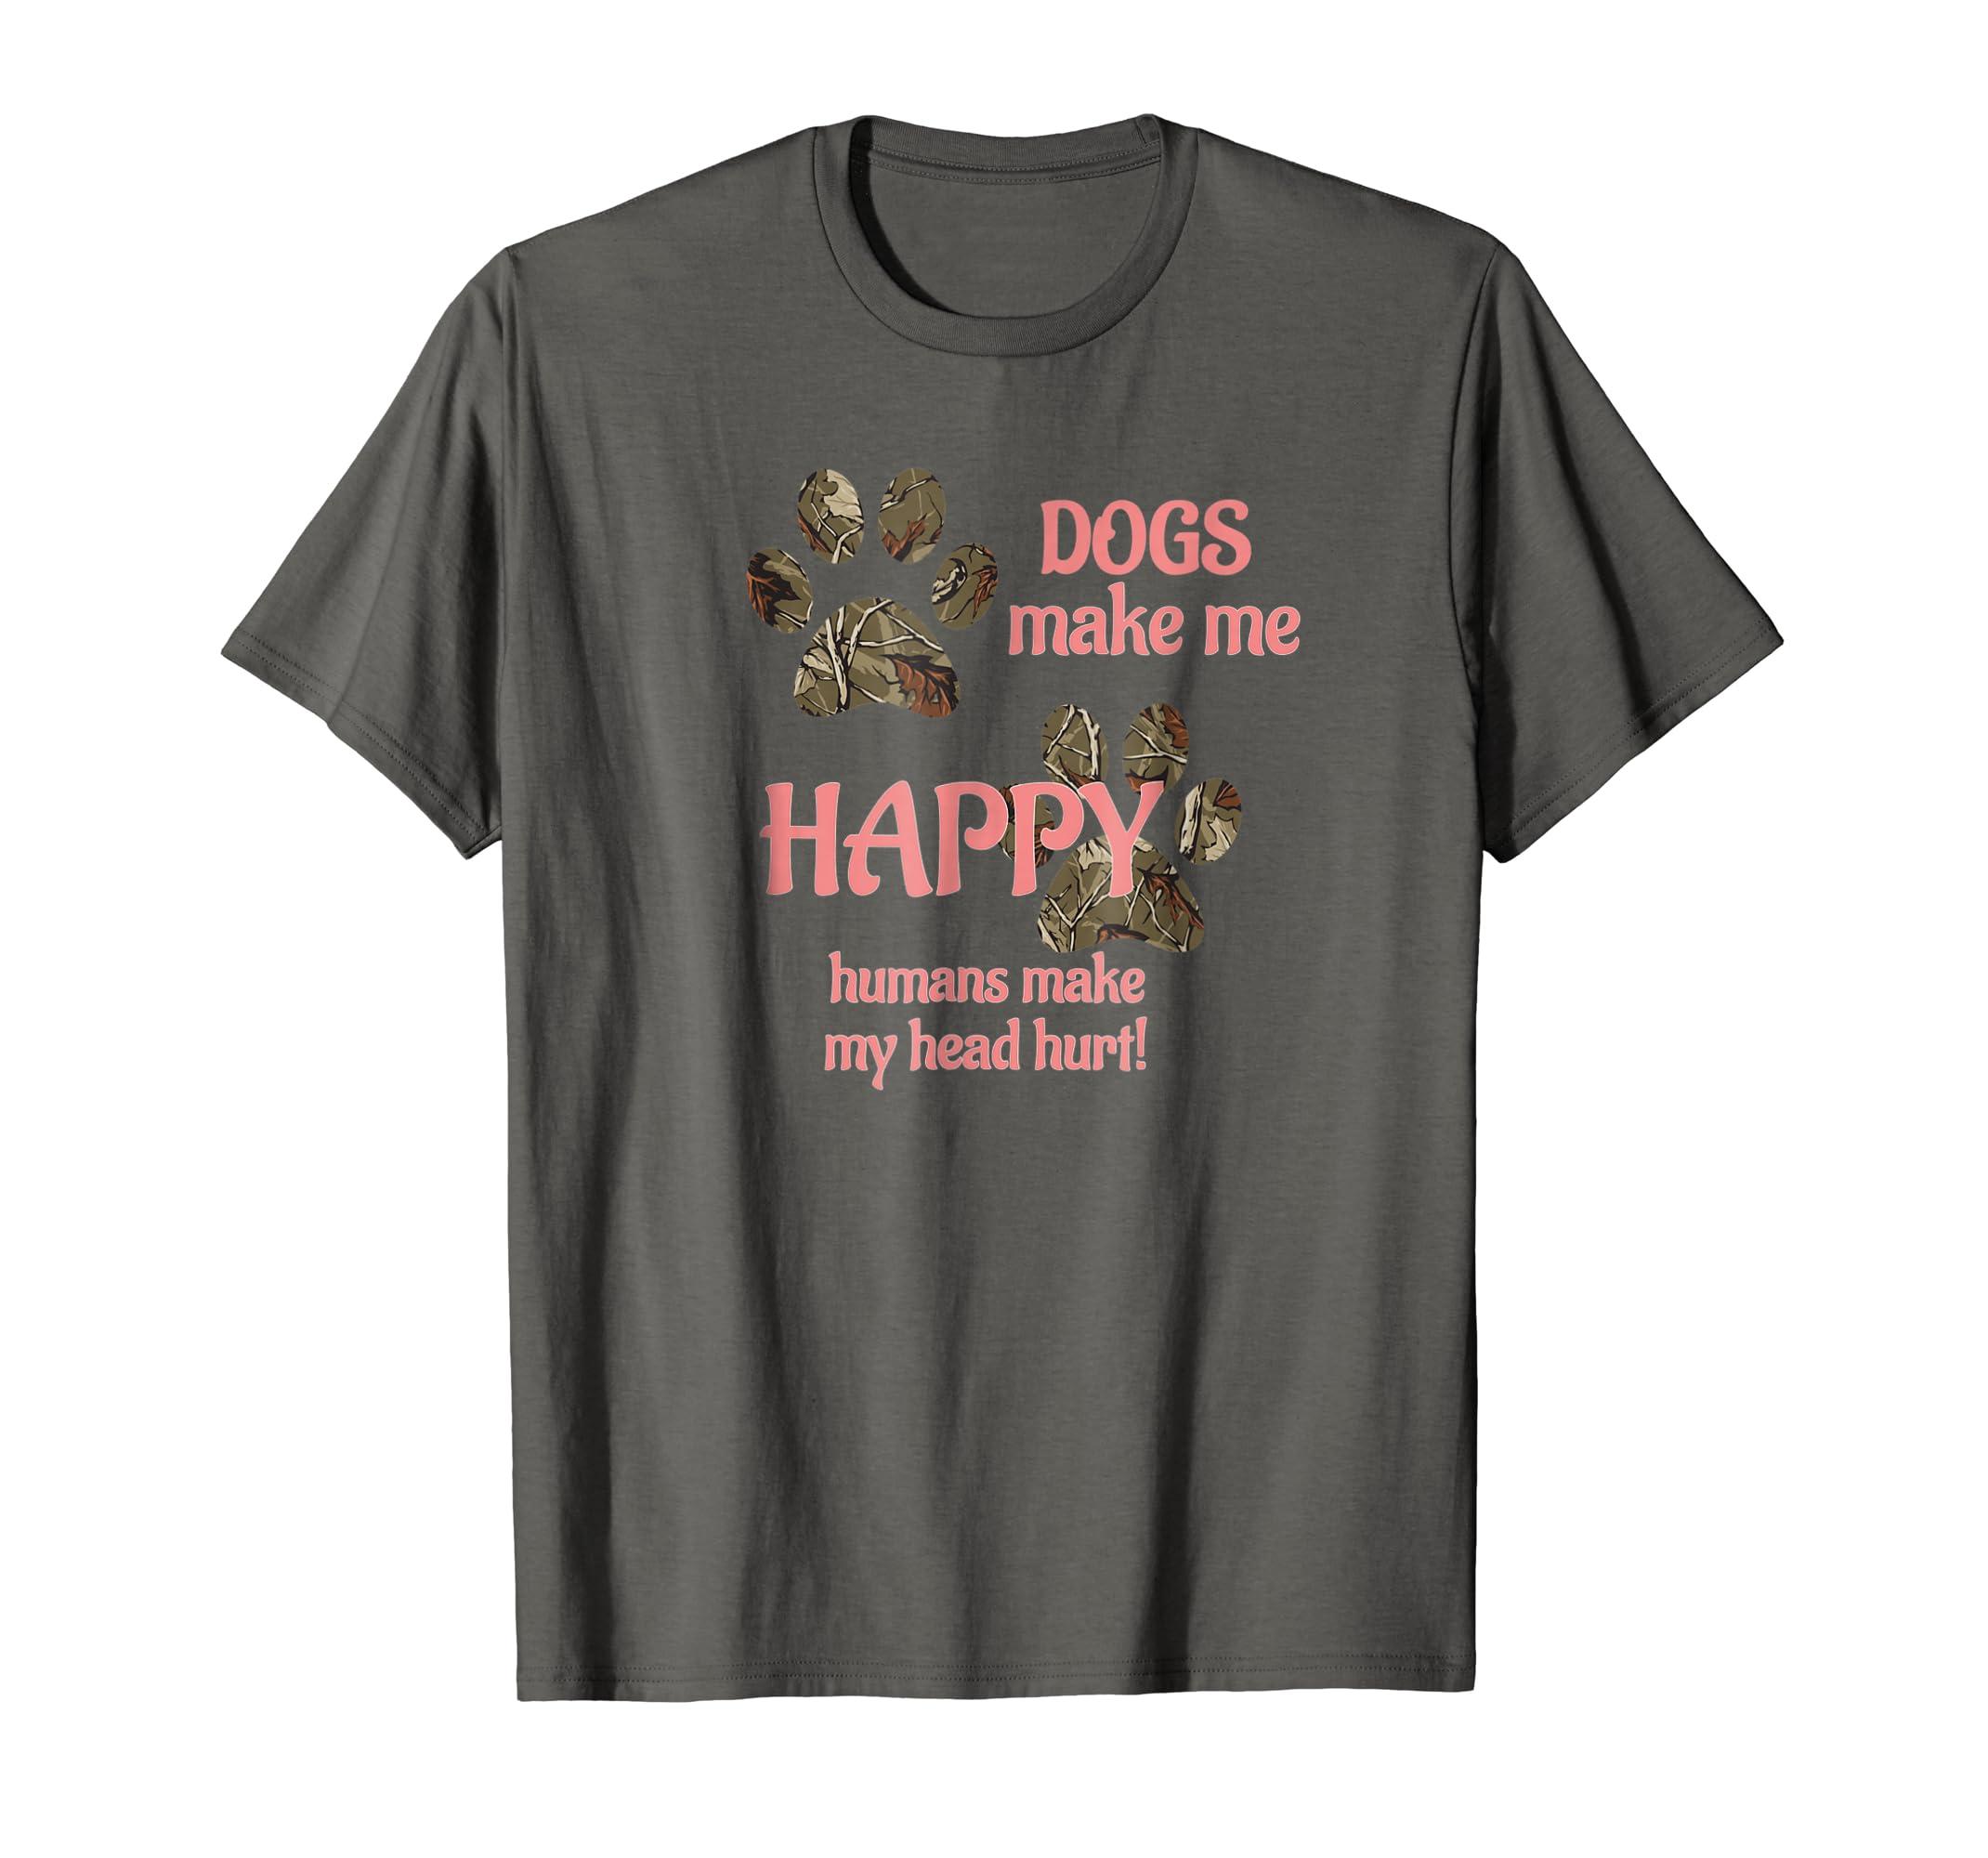 Dogs Make Me Happy, Humans Make My Head Hurt T-shirt-AZP